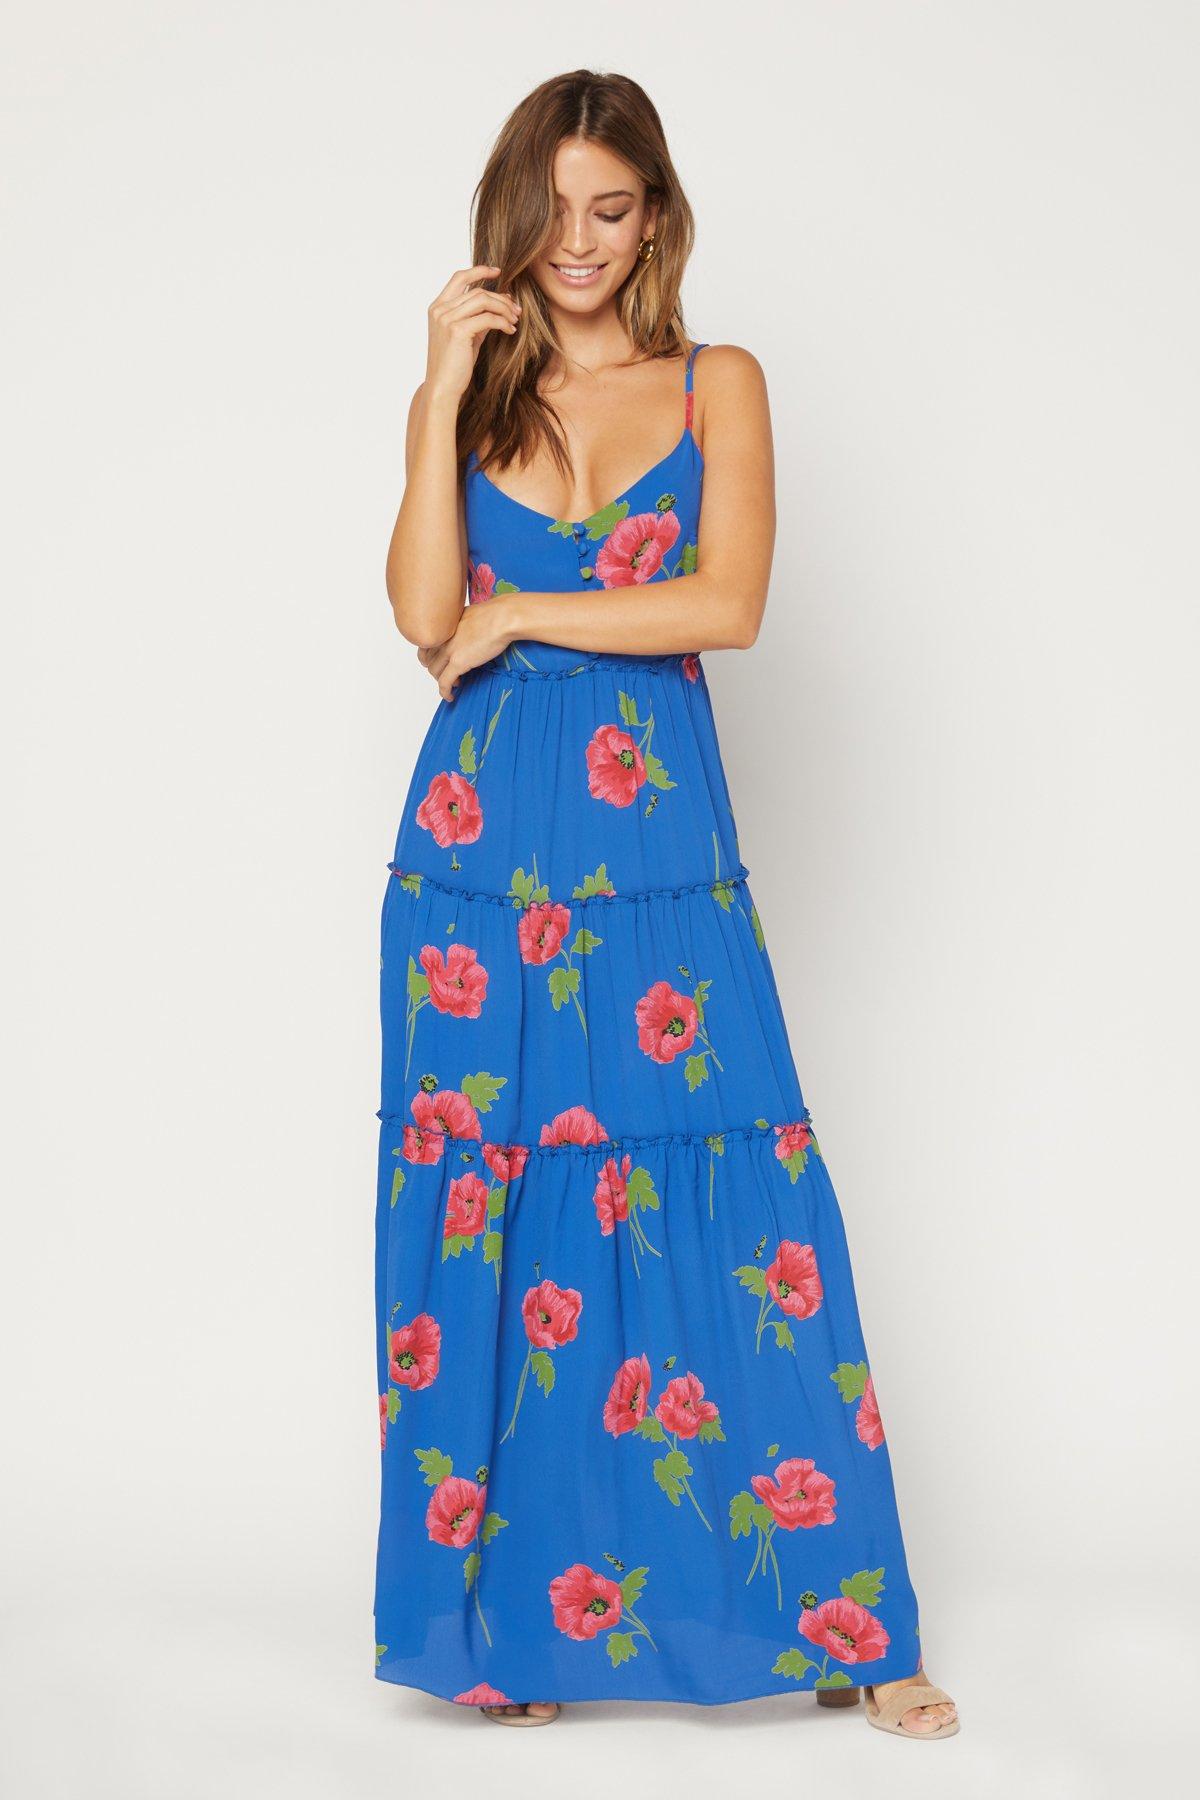 California Chic Clothing Guide // Flynn Sky